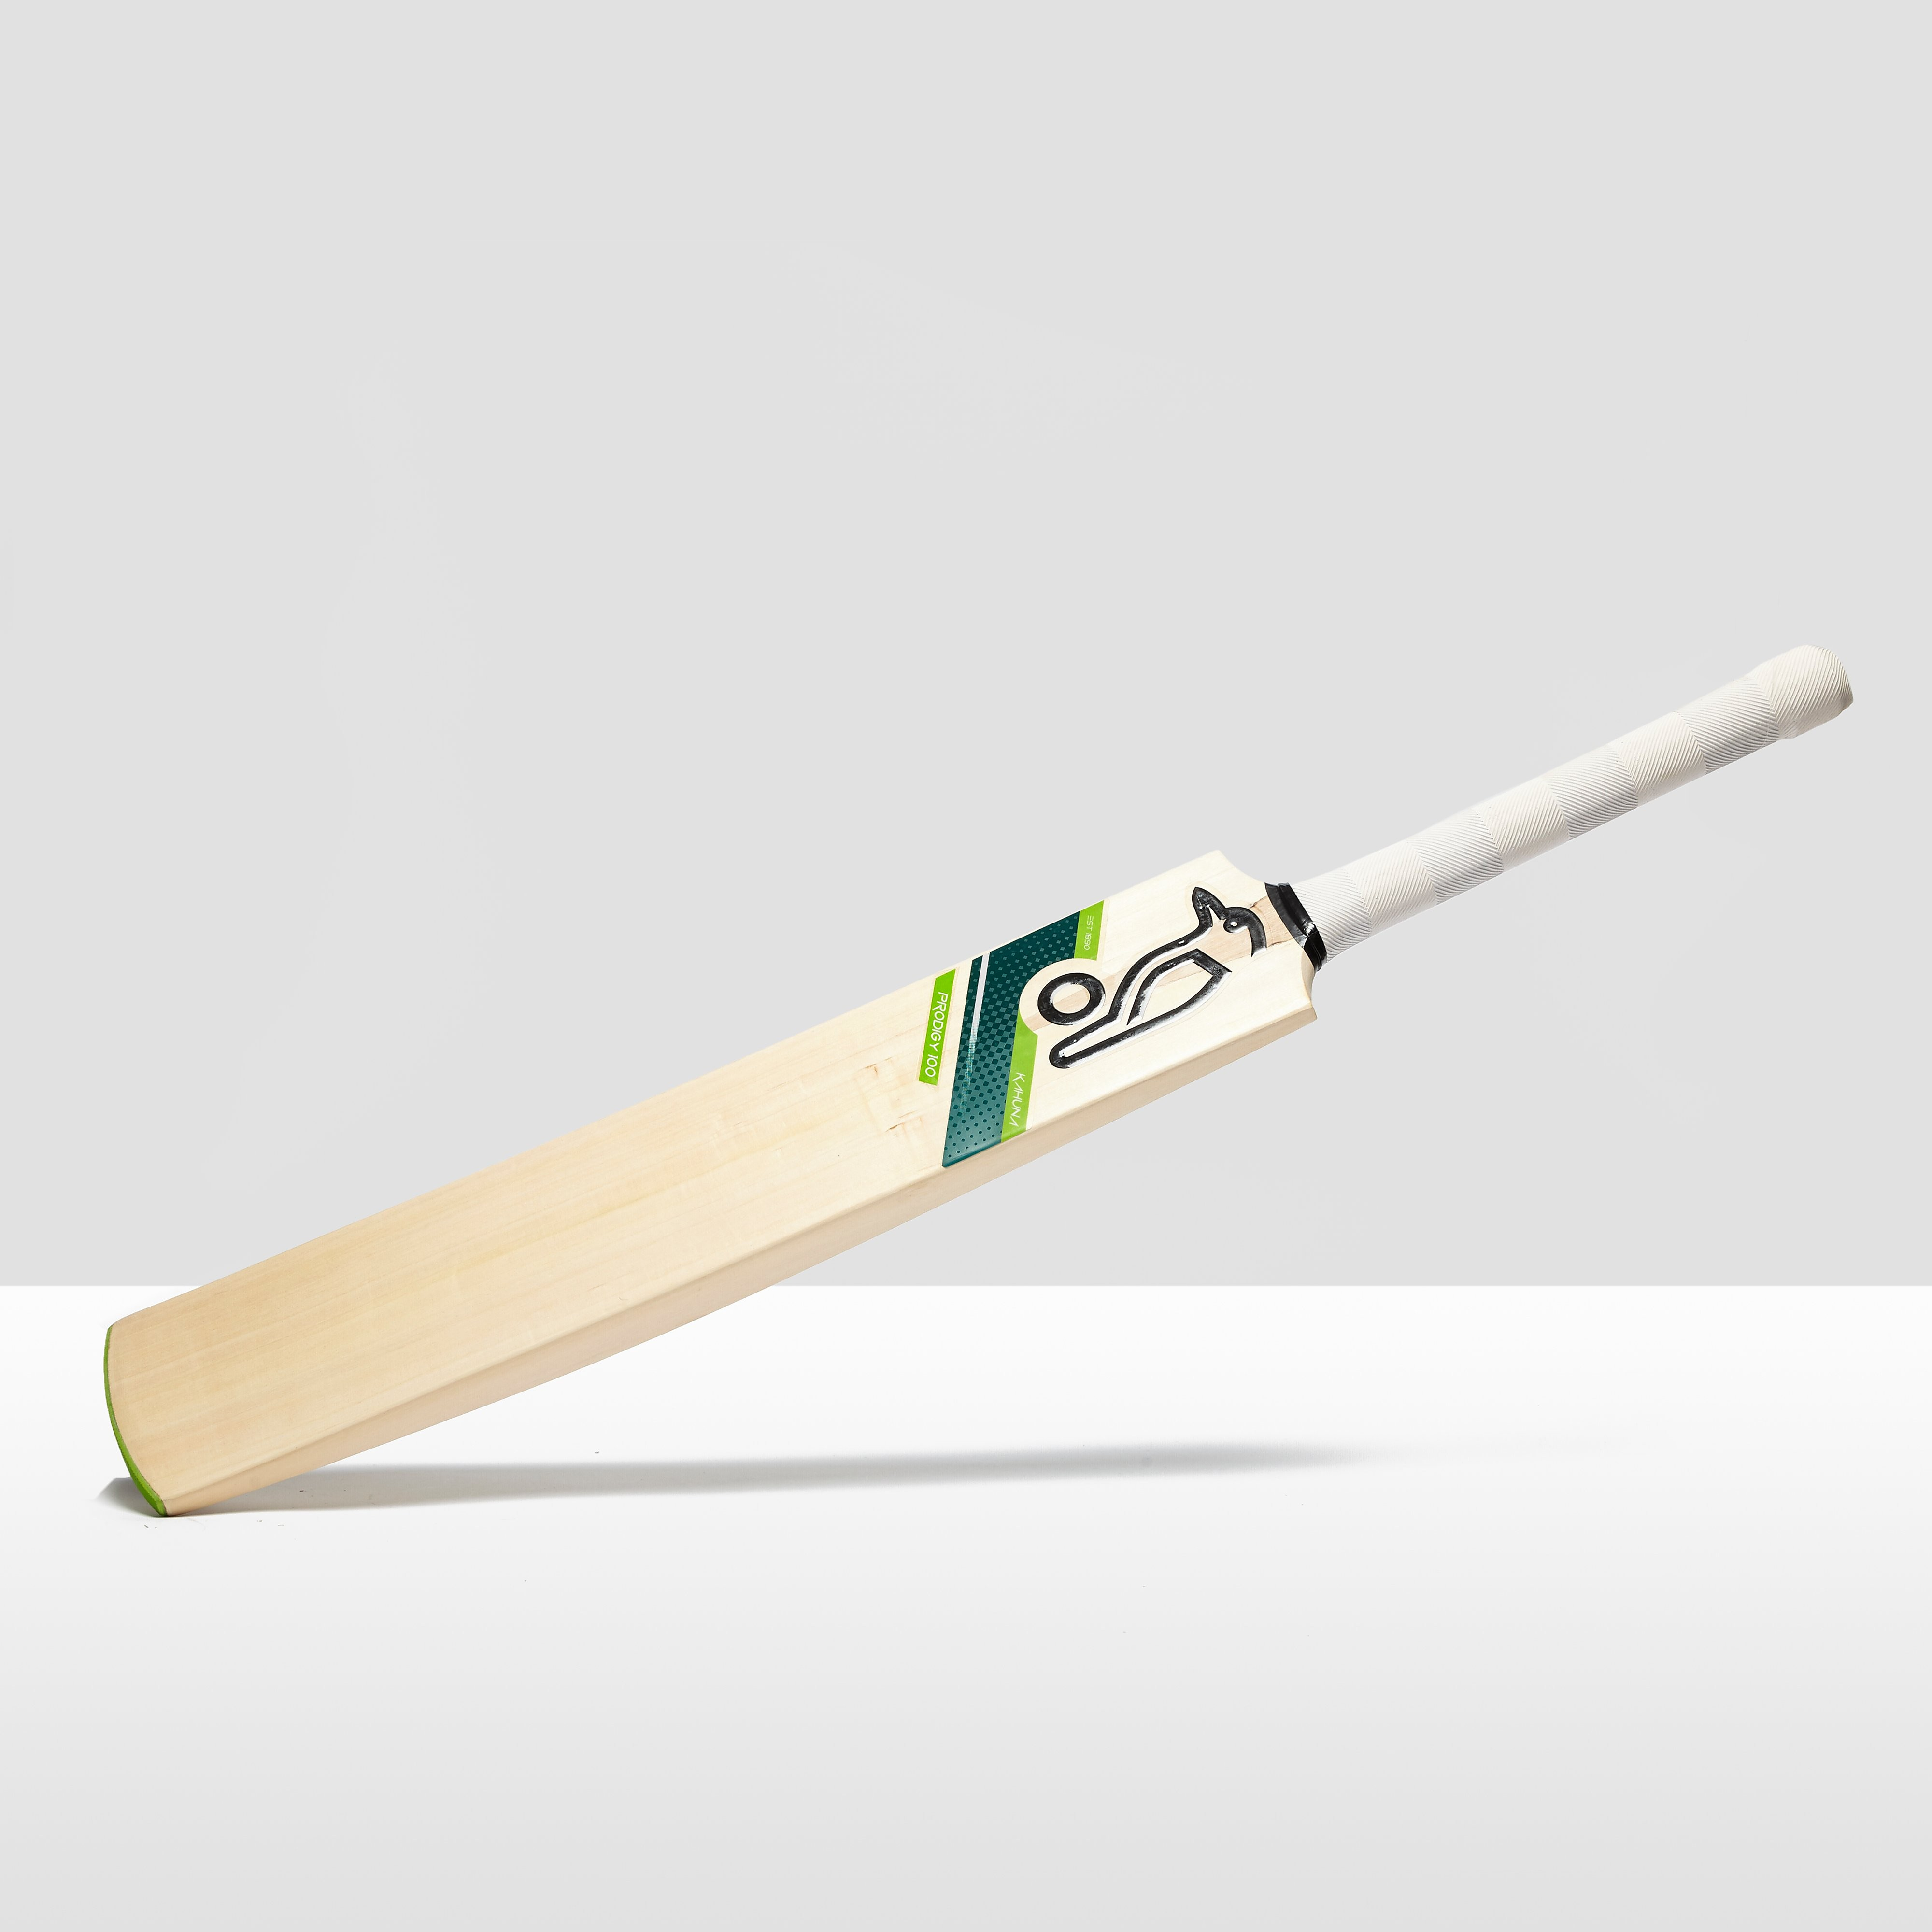 Kookaburra Kahuna Prodigy 100 Junior Cricket Bat